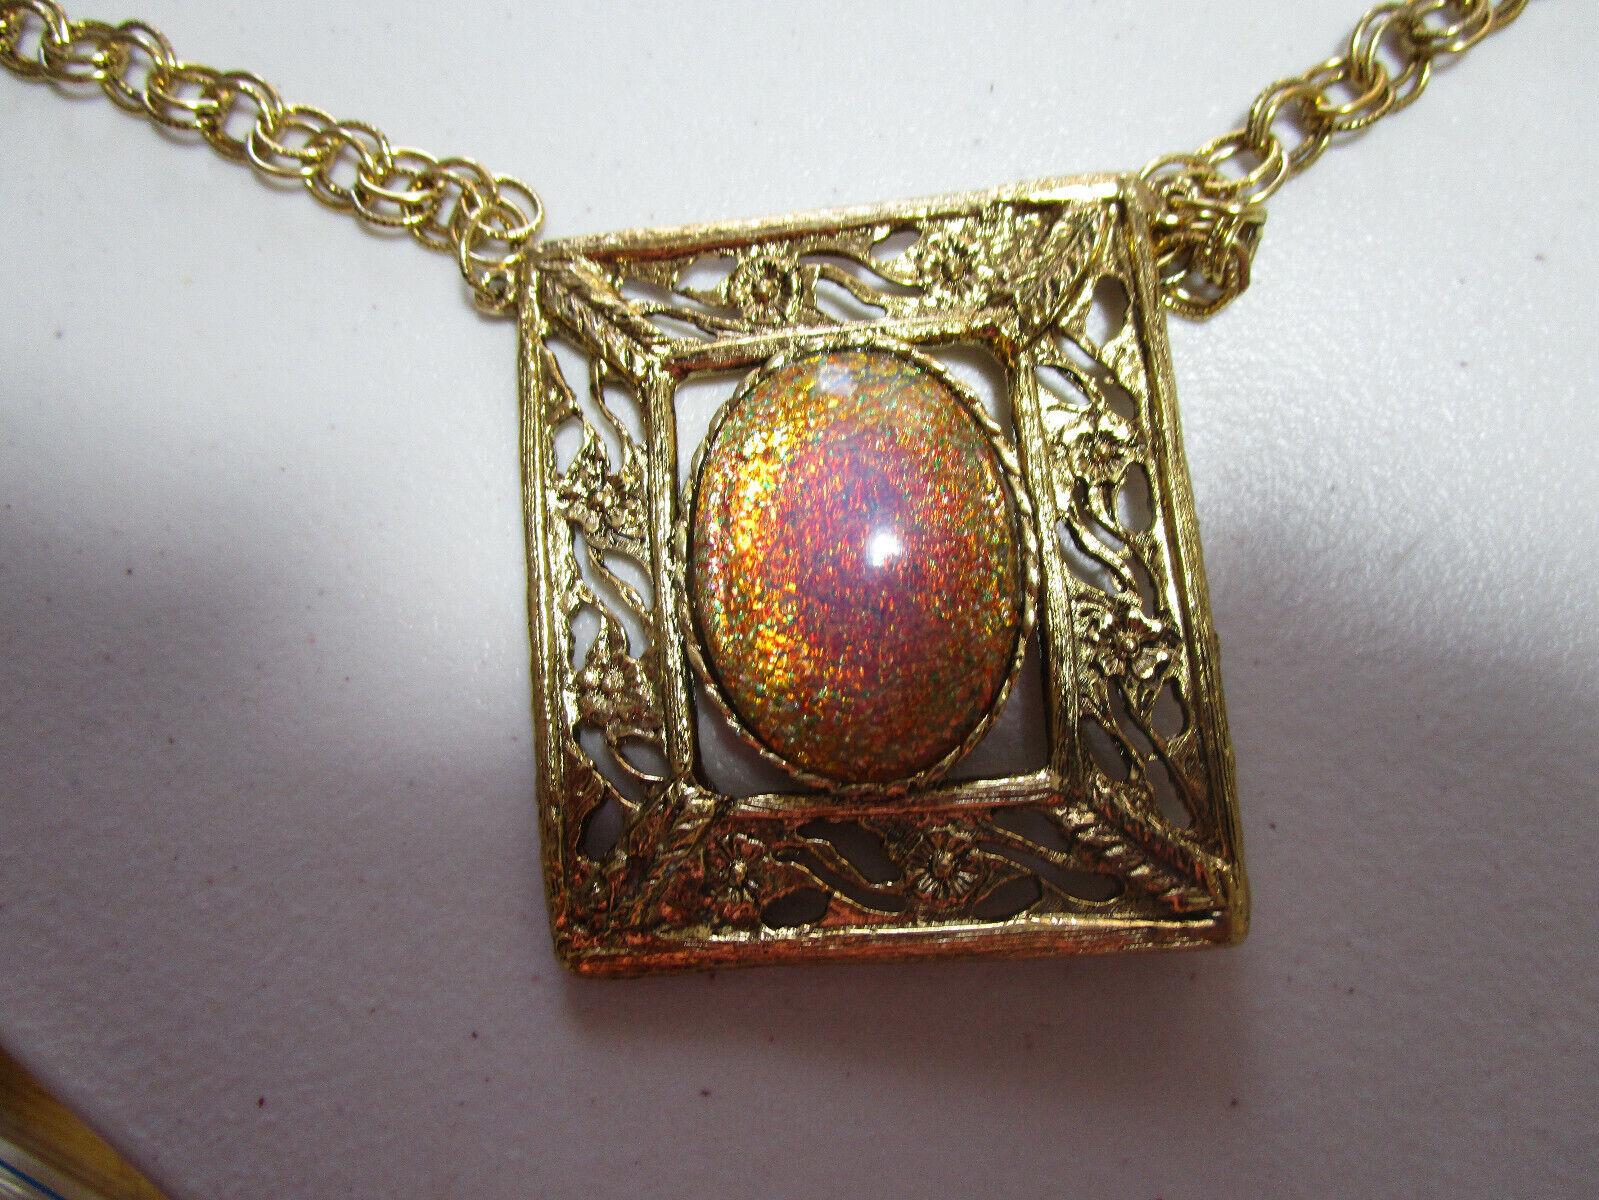 Jewellery - Very Nice Constume Jewellery Necklace.....